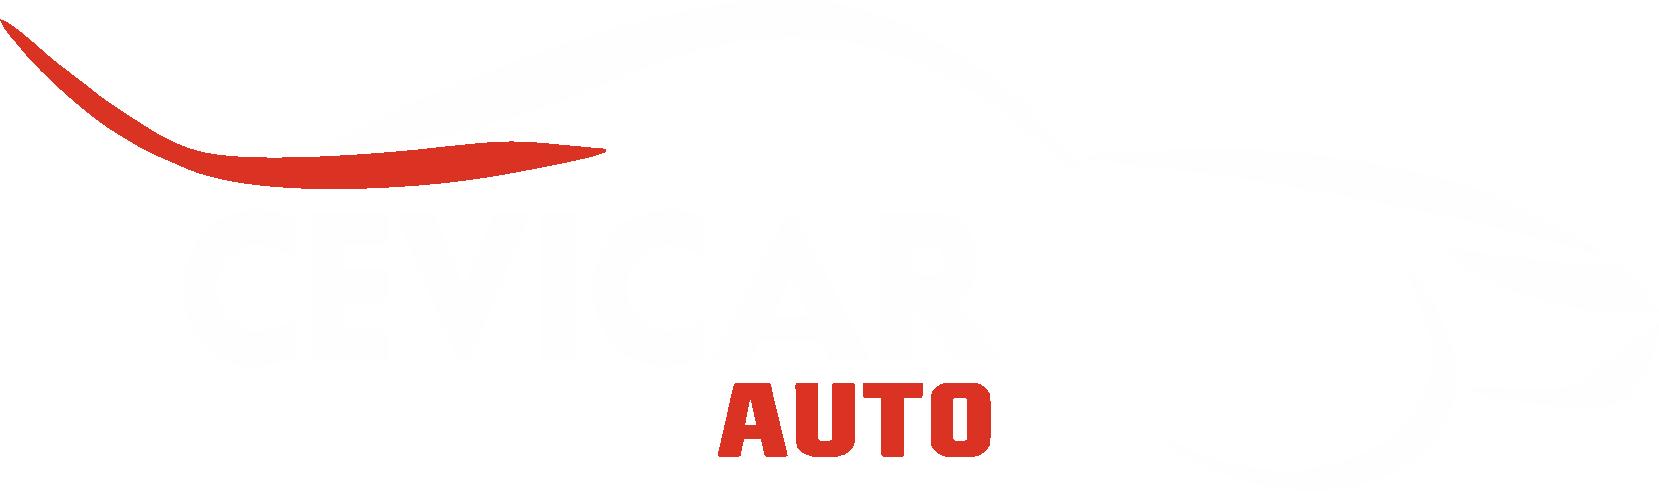 Cevicar Auto – Vehículos de Ocasión